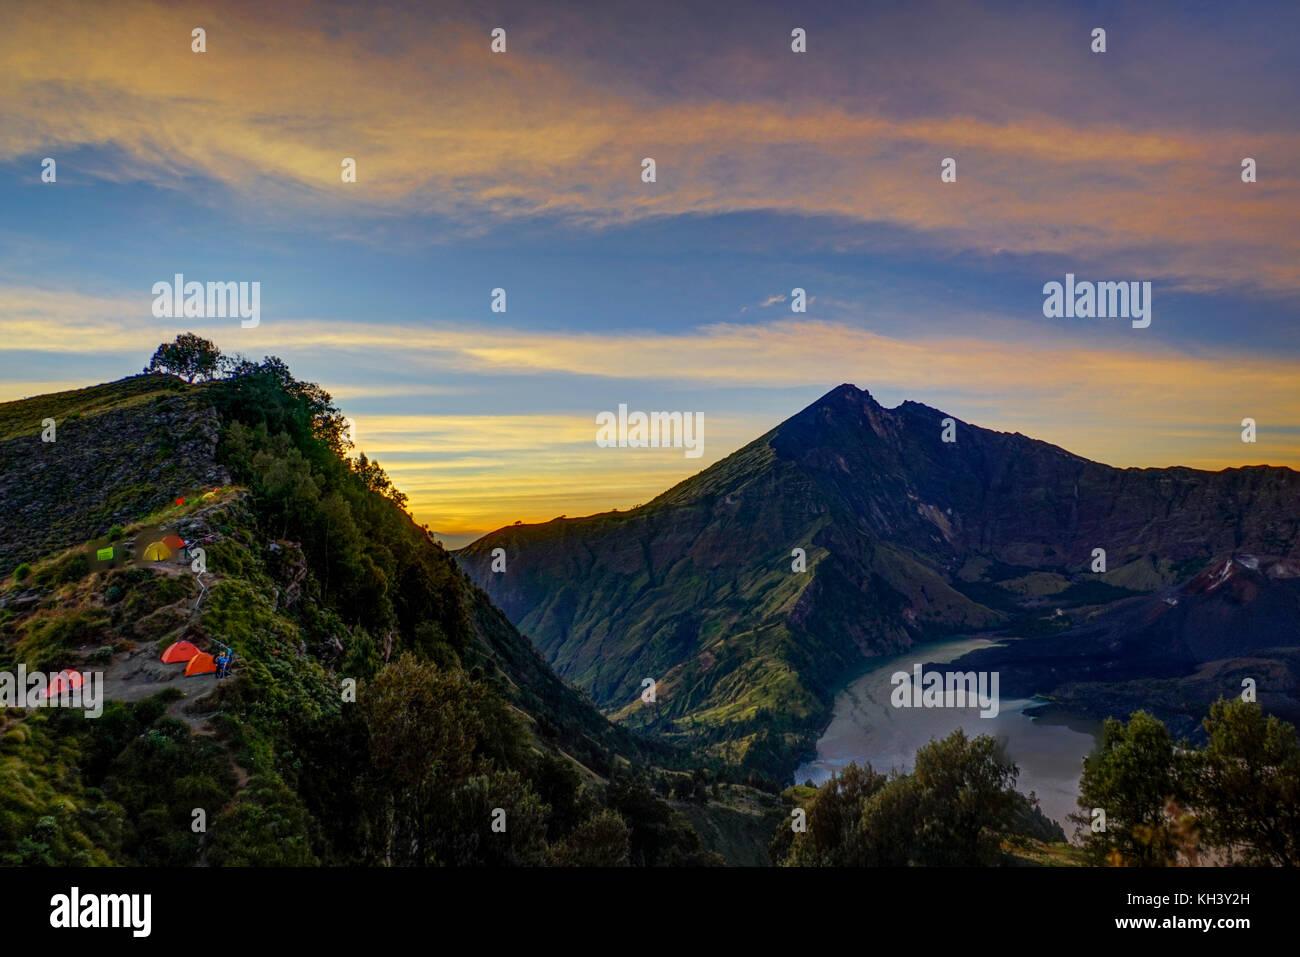 Sunrise Mount Rinjani vulcano with tents Lombok Indonesia - Stock Image